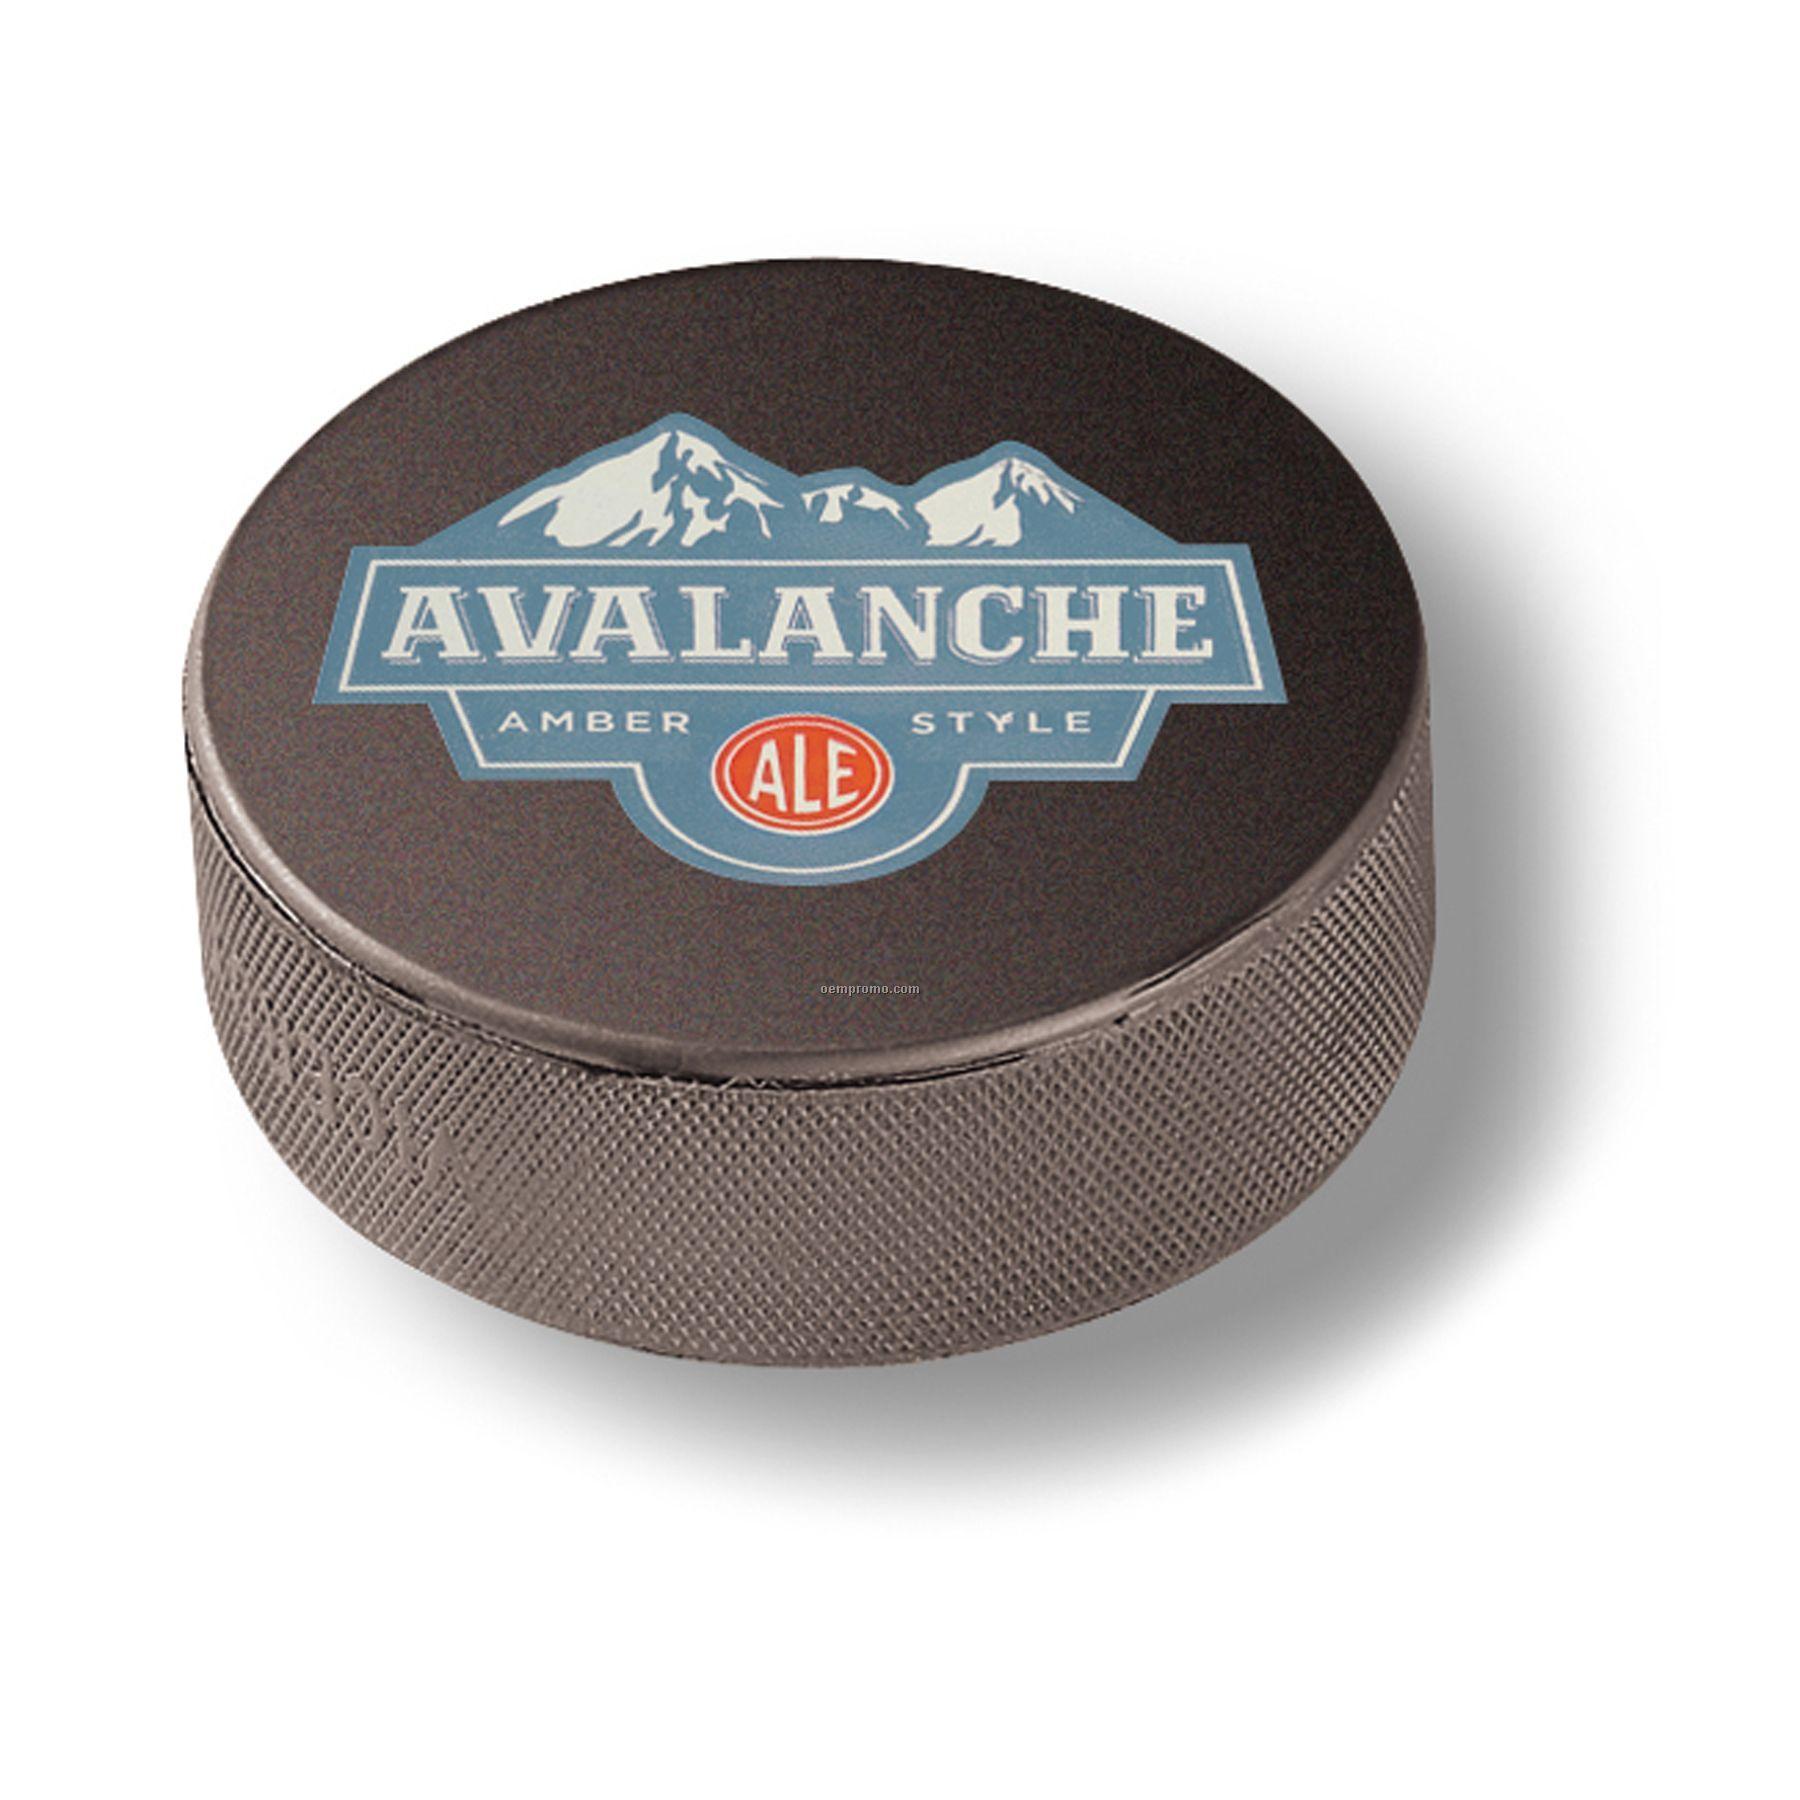 Official Size Souvenir Hockey Puck (1 Color)